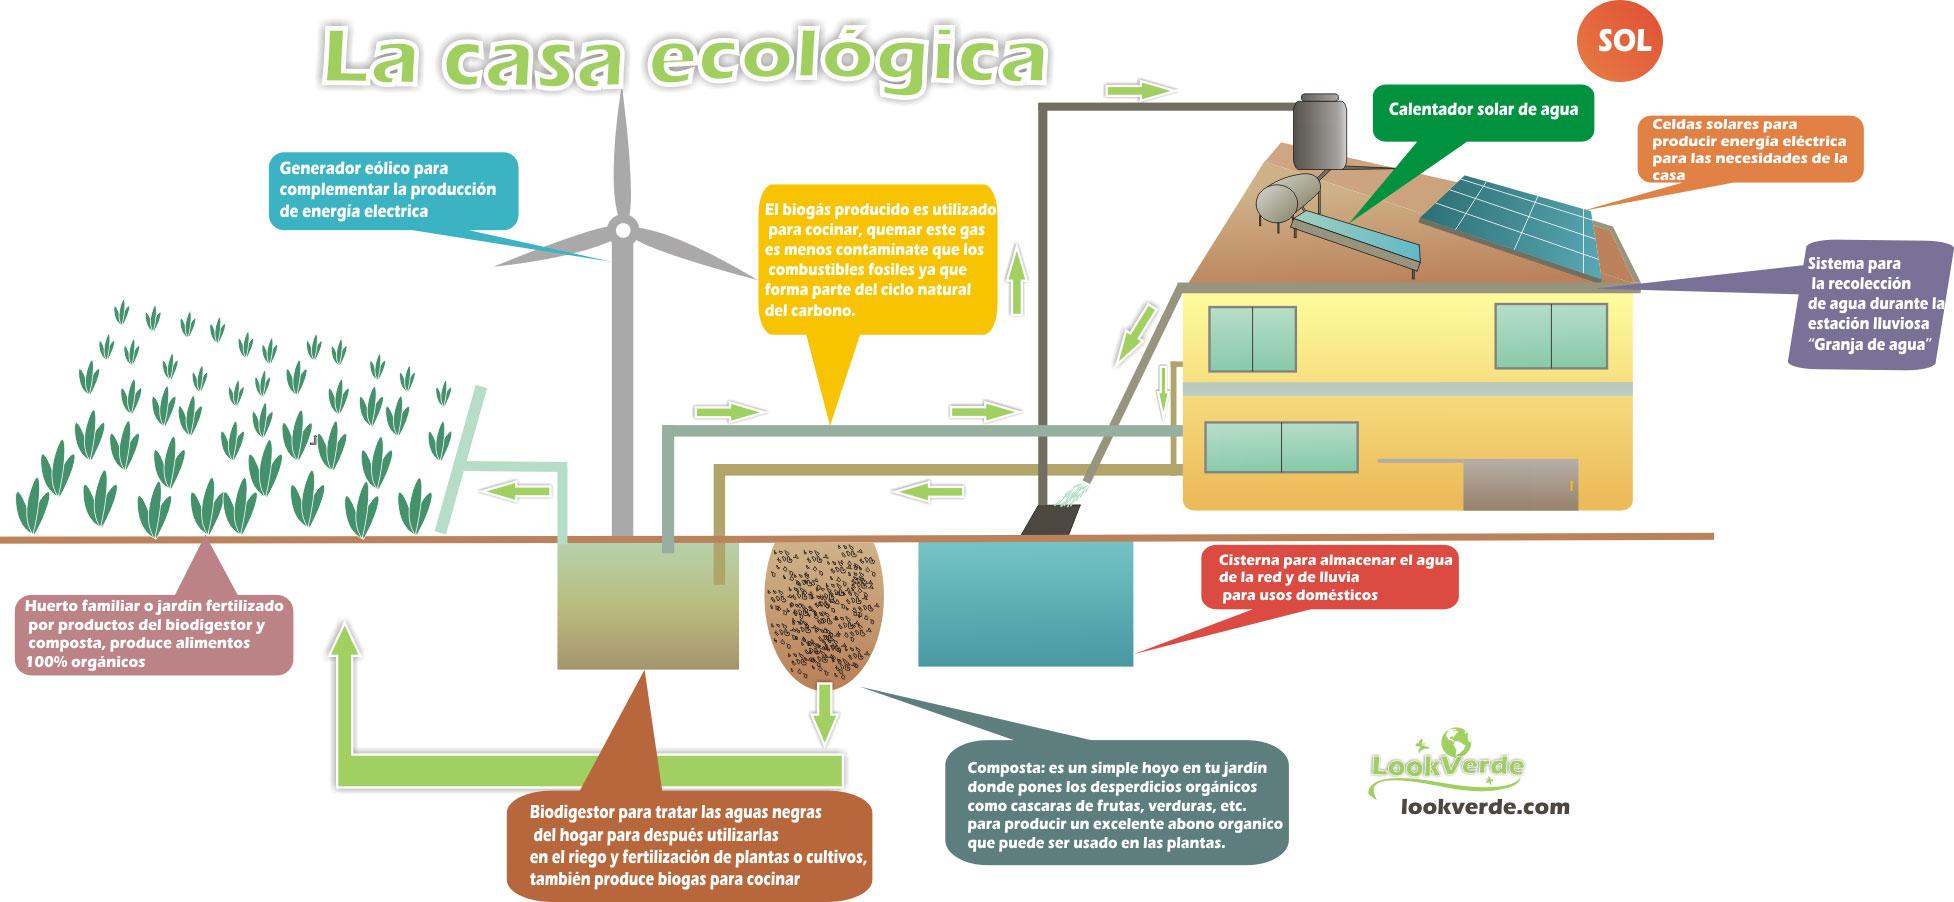 Planospara author at planos de casas planos de for Proyectos de casas ecologicas